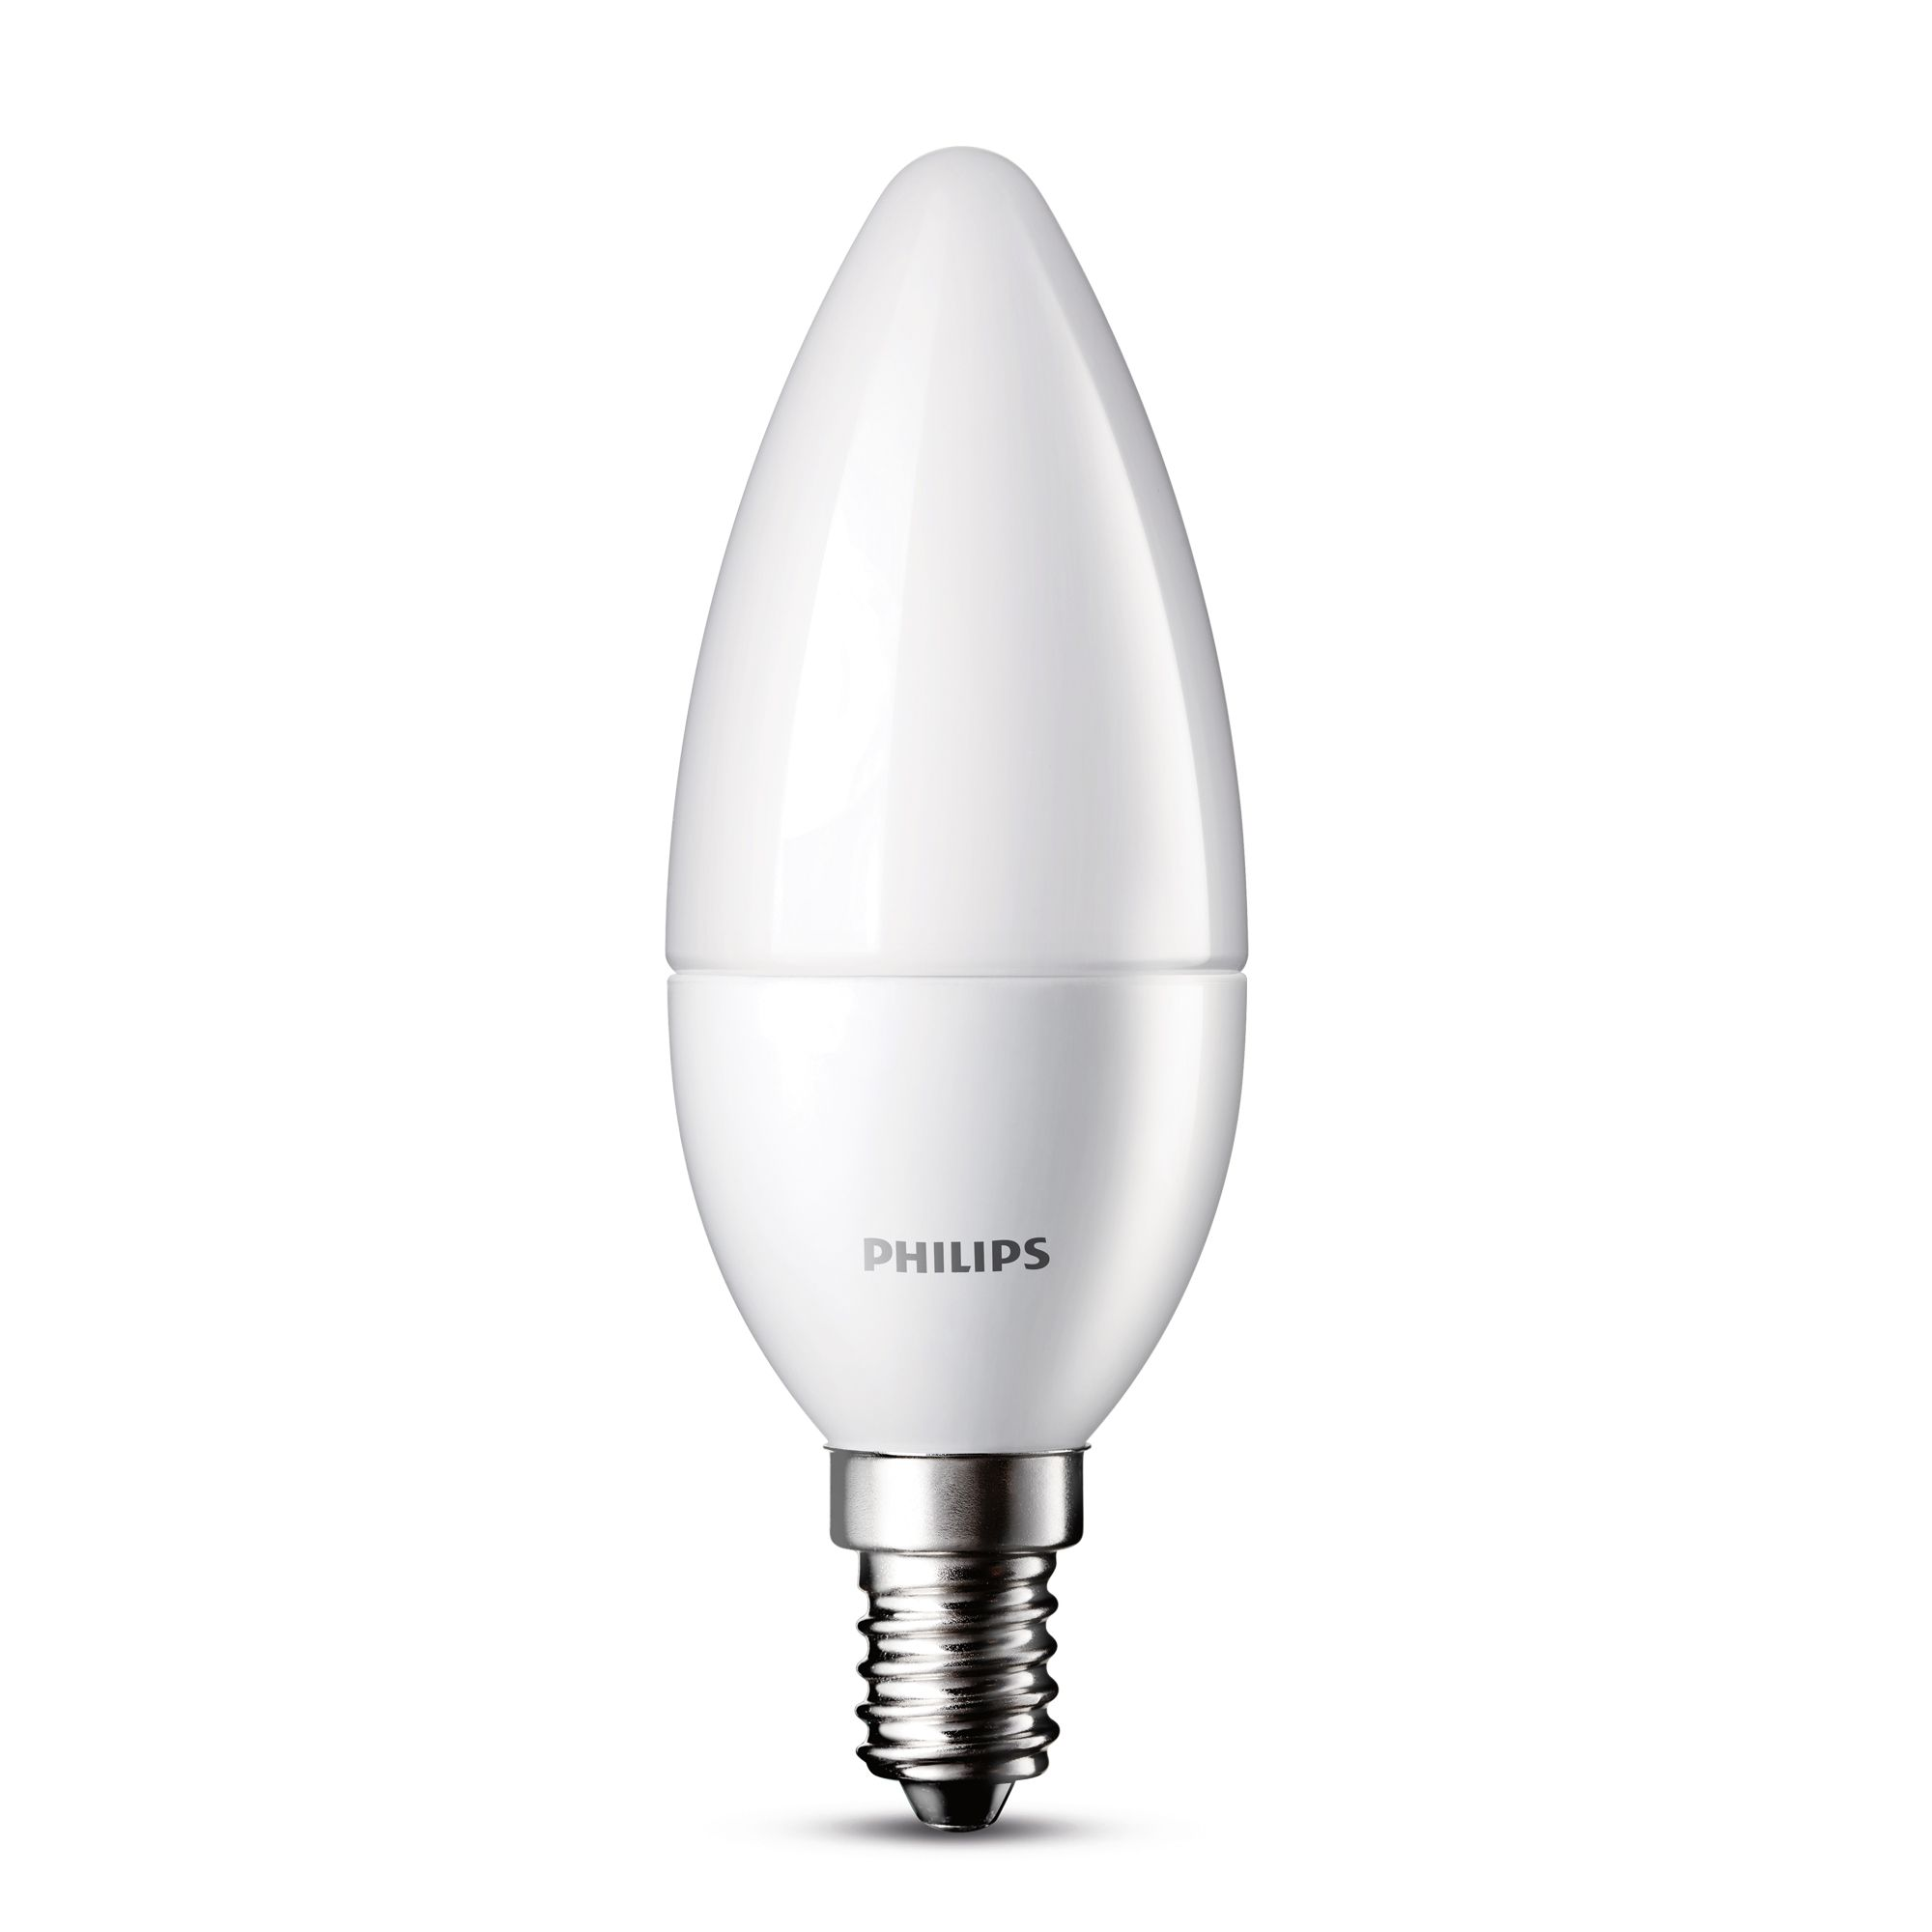 Set 4 lampadine led luce bianca calda qvc italia for Lampadine faretti led luce calda